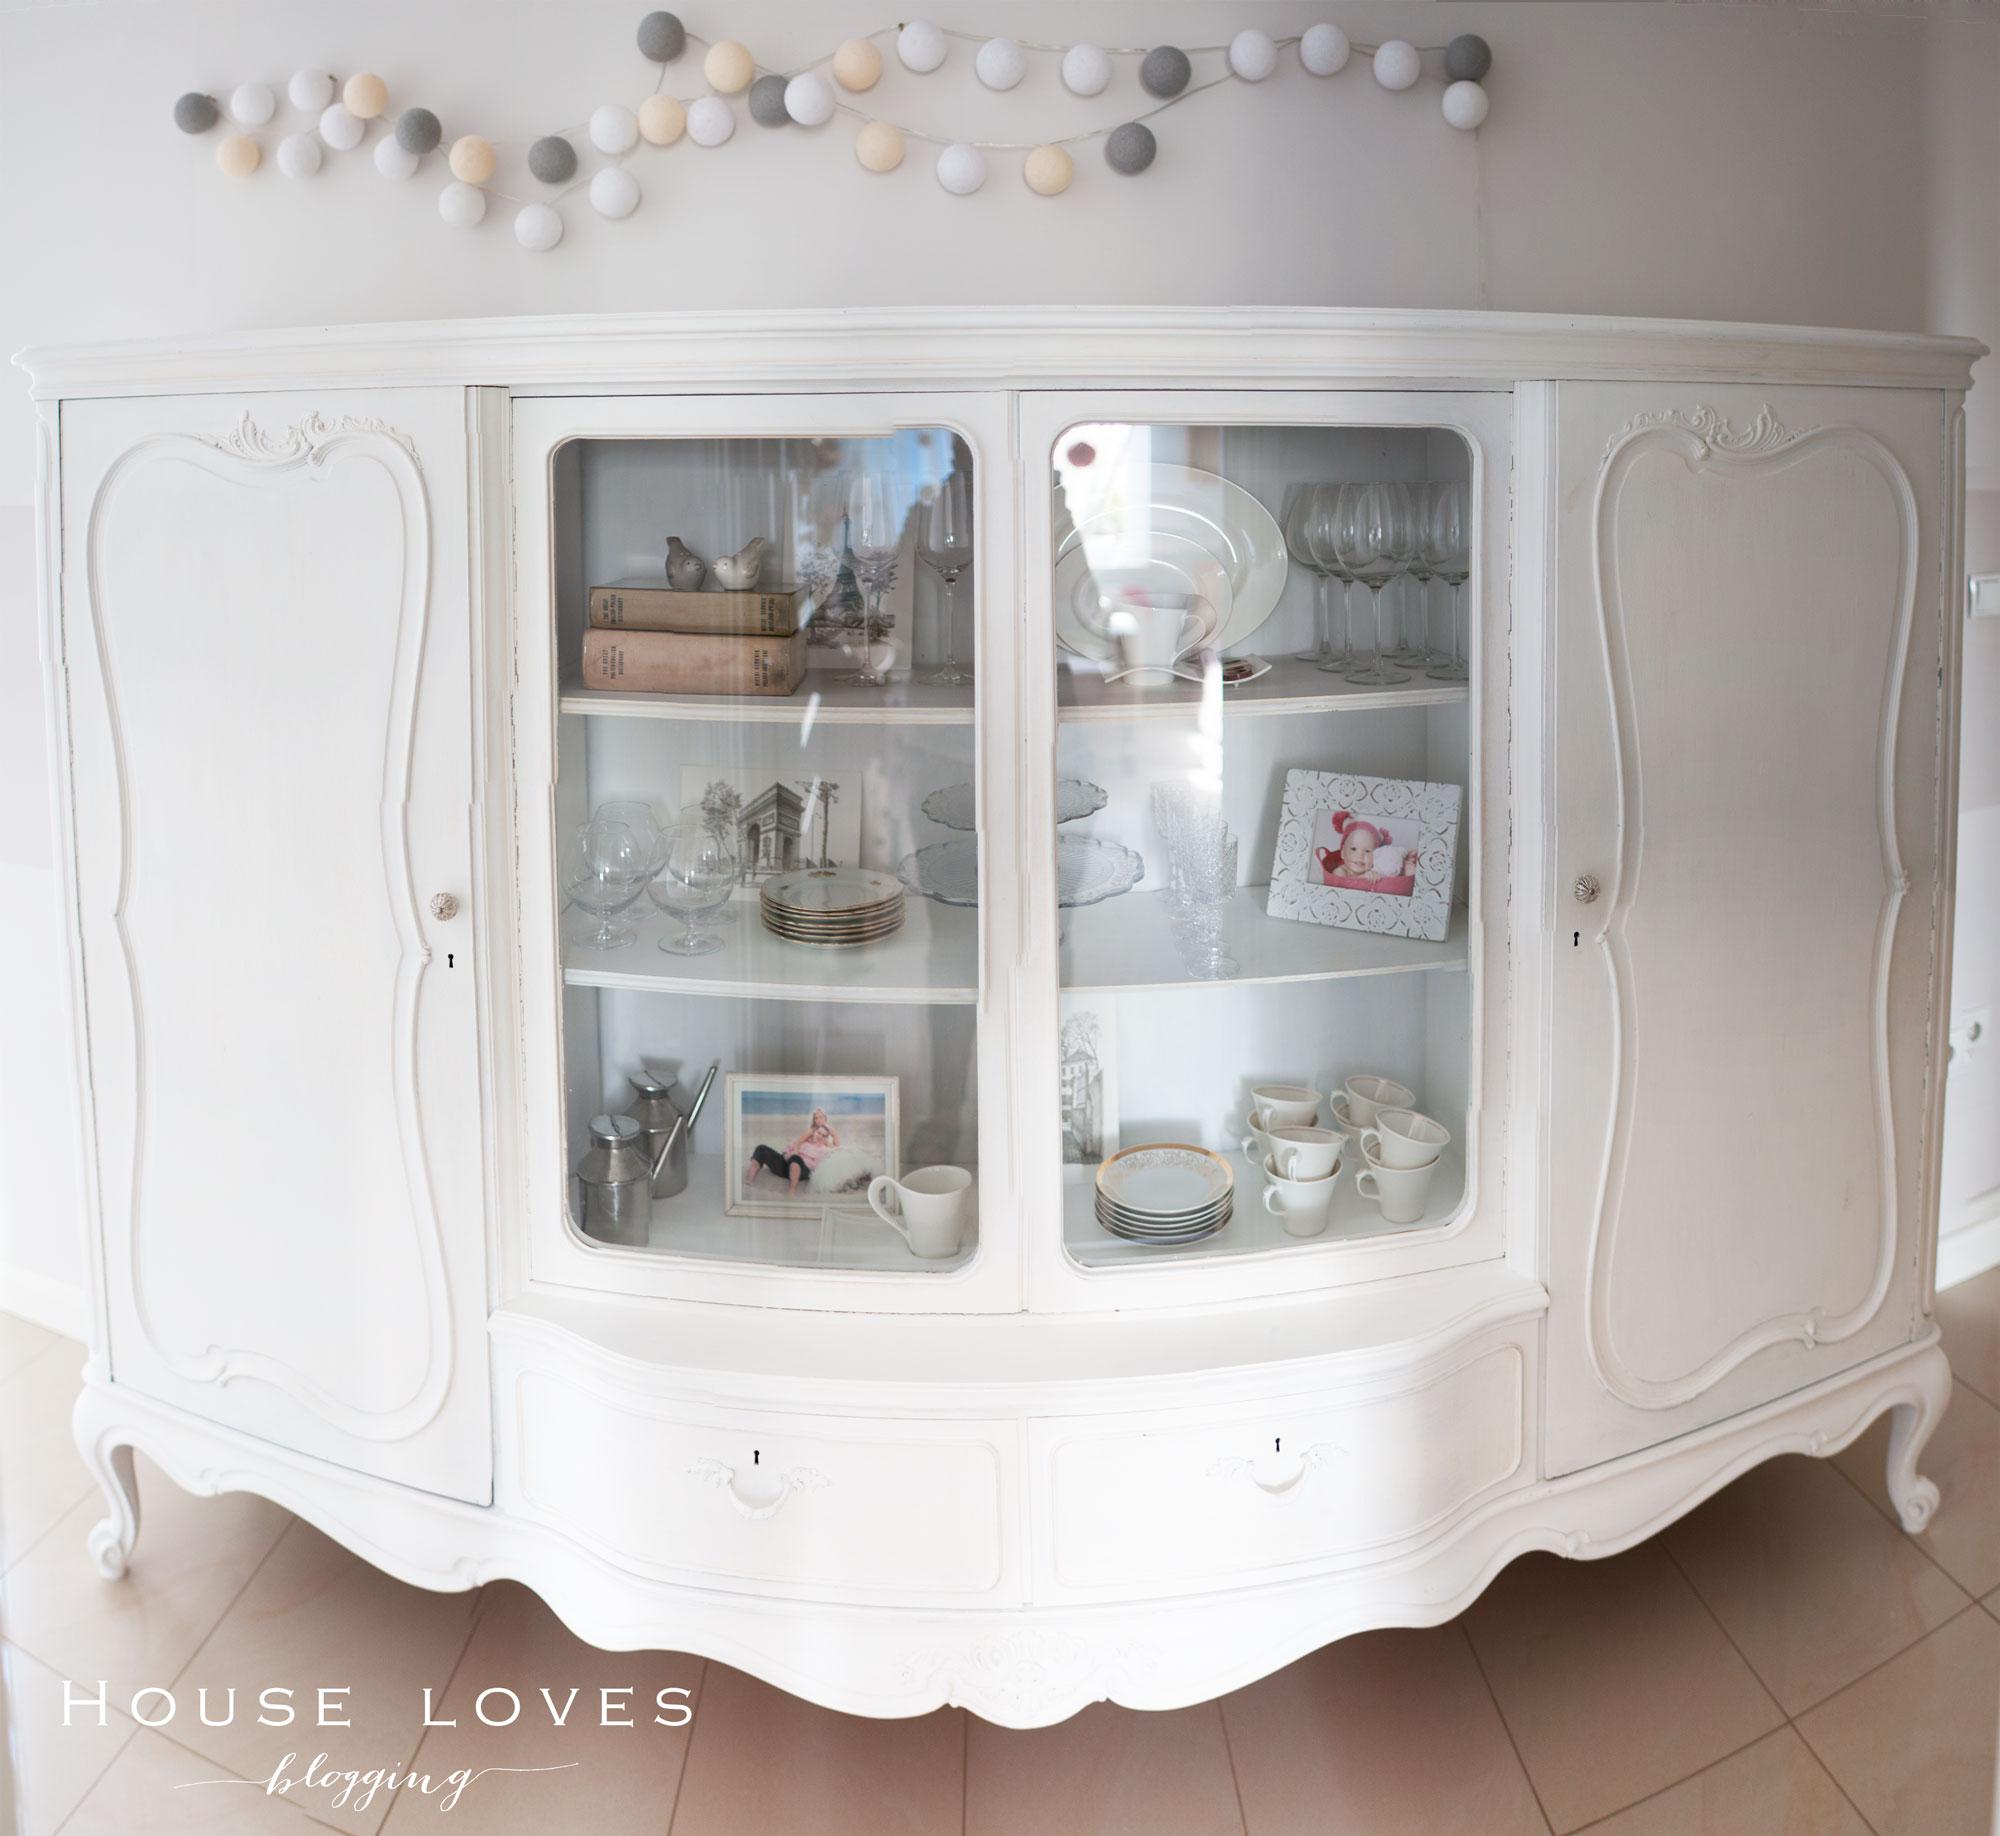 Przemalowana Witryna  Glasscase Make Over  HOUSE LOVES